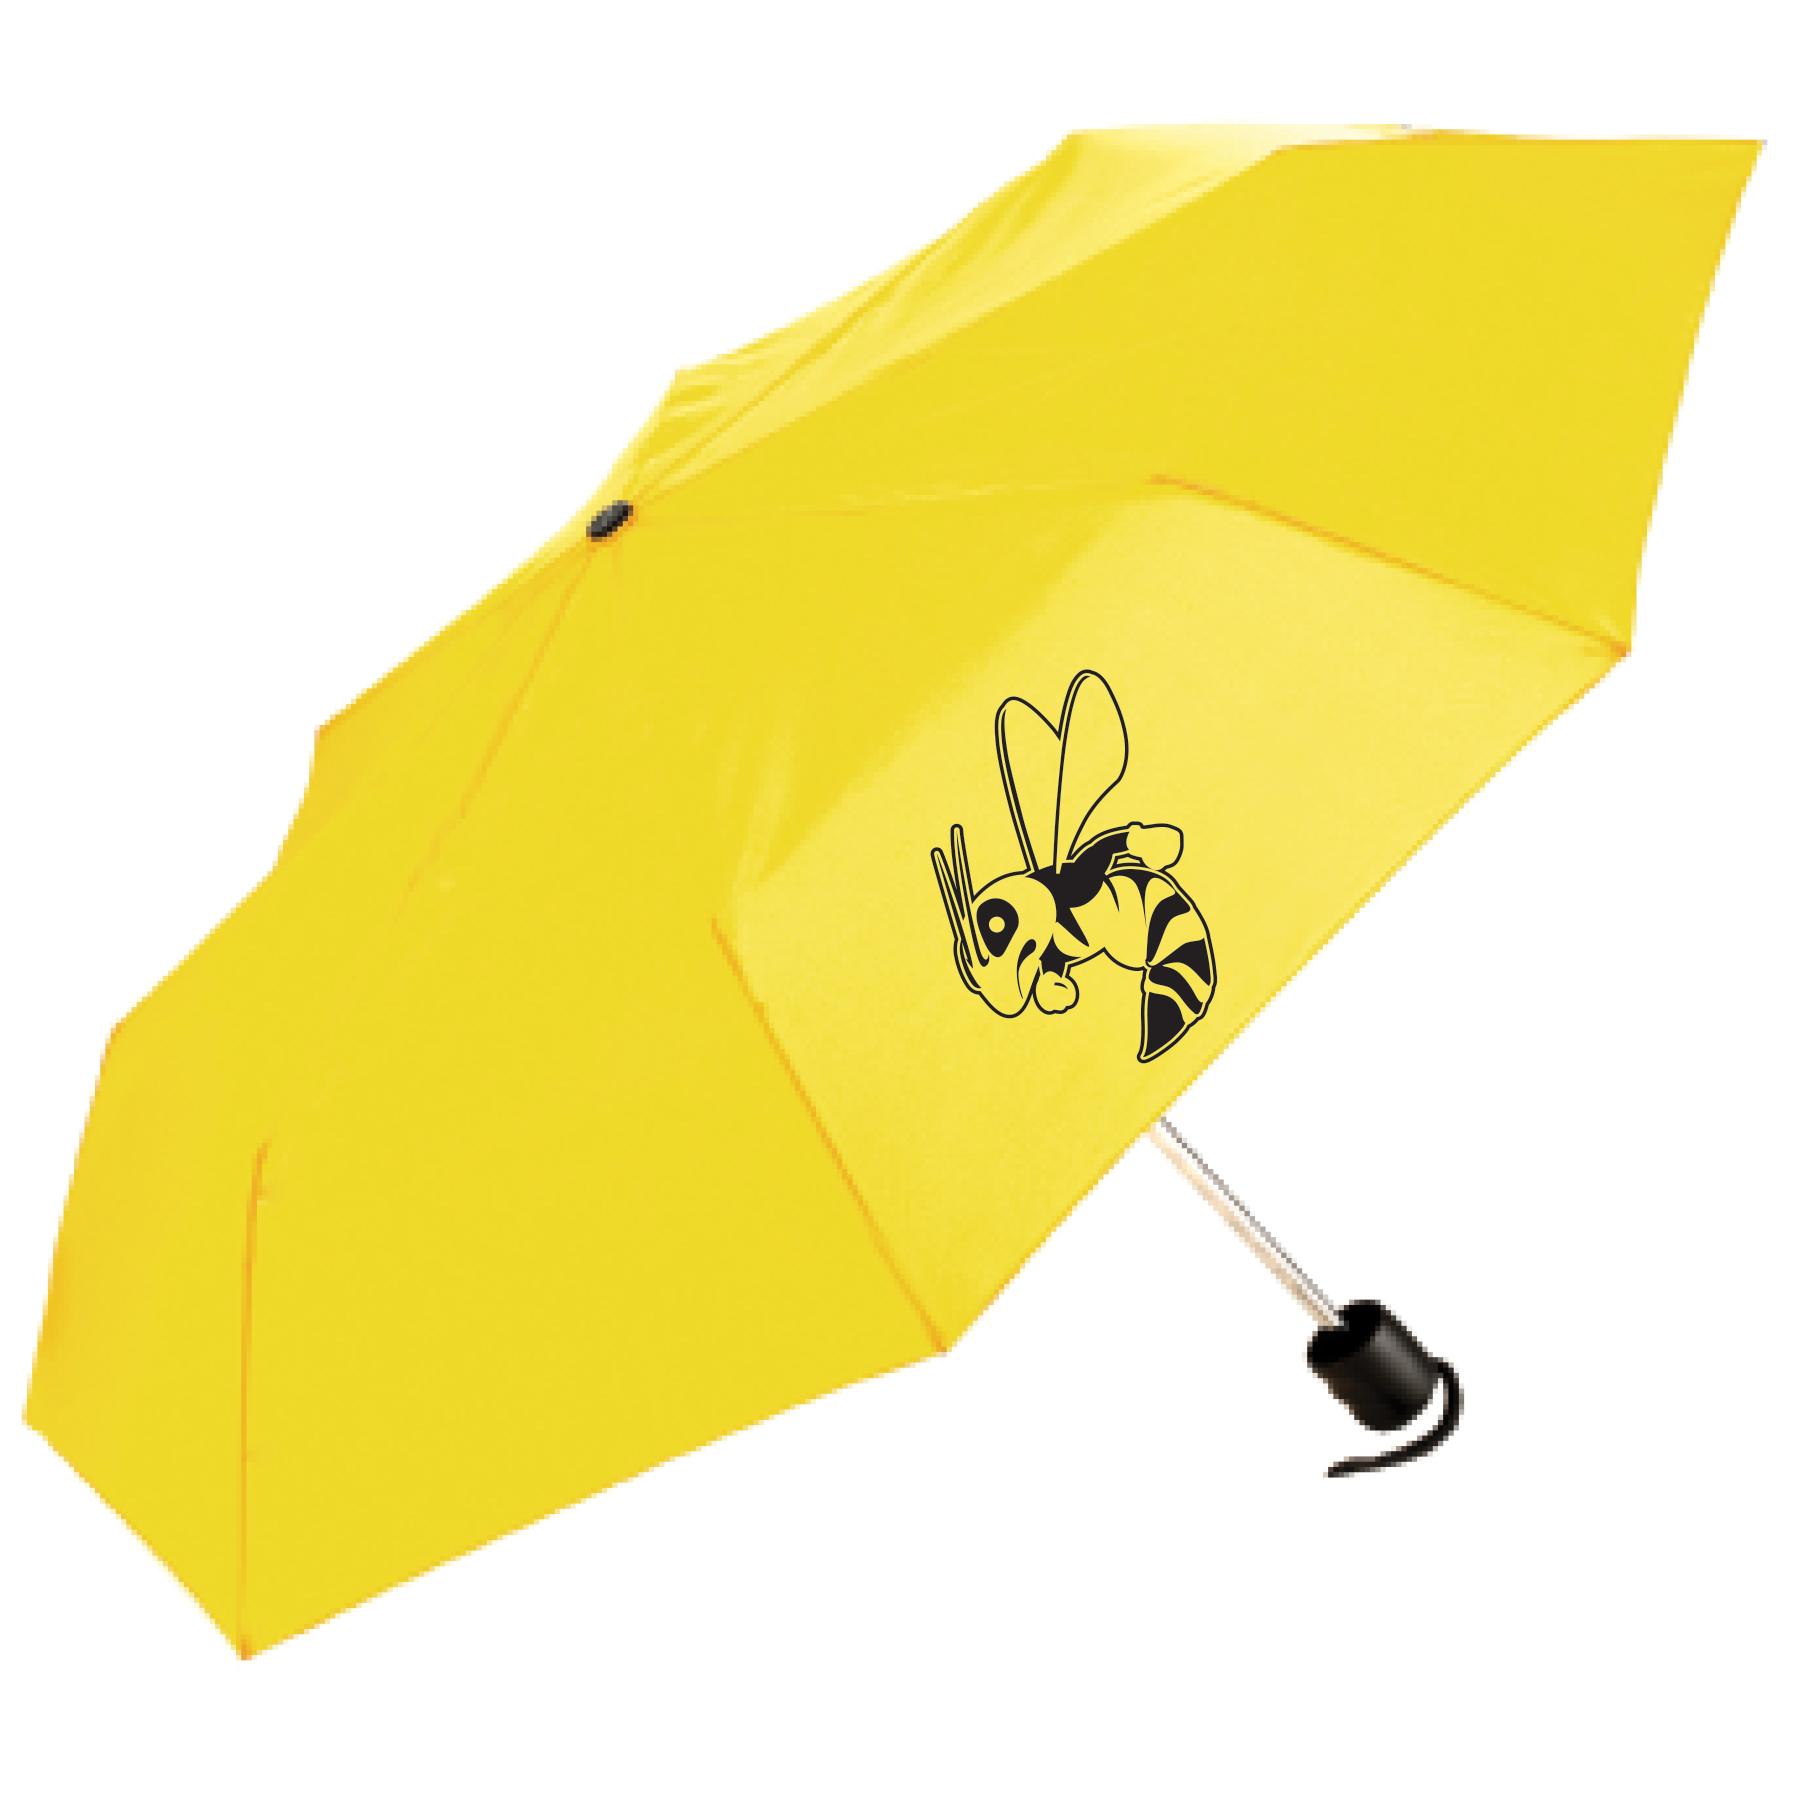 Hornet Umbrella